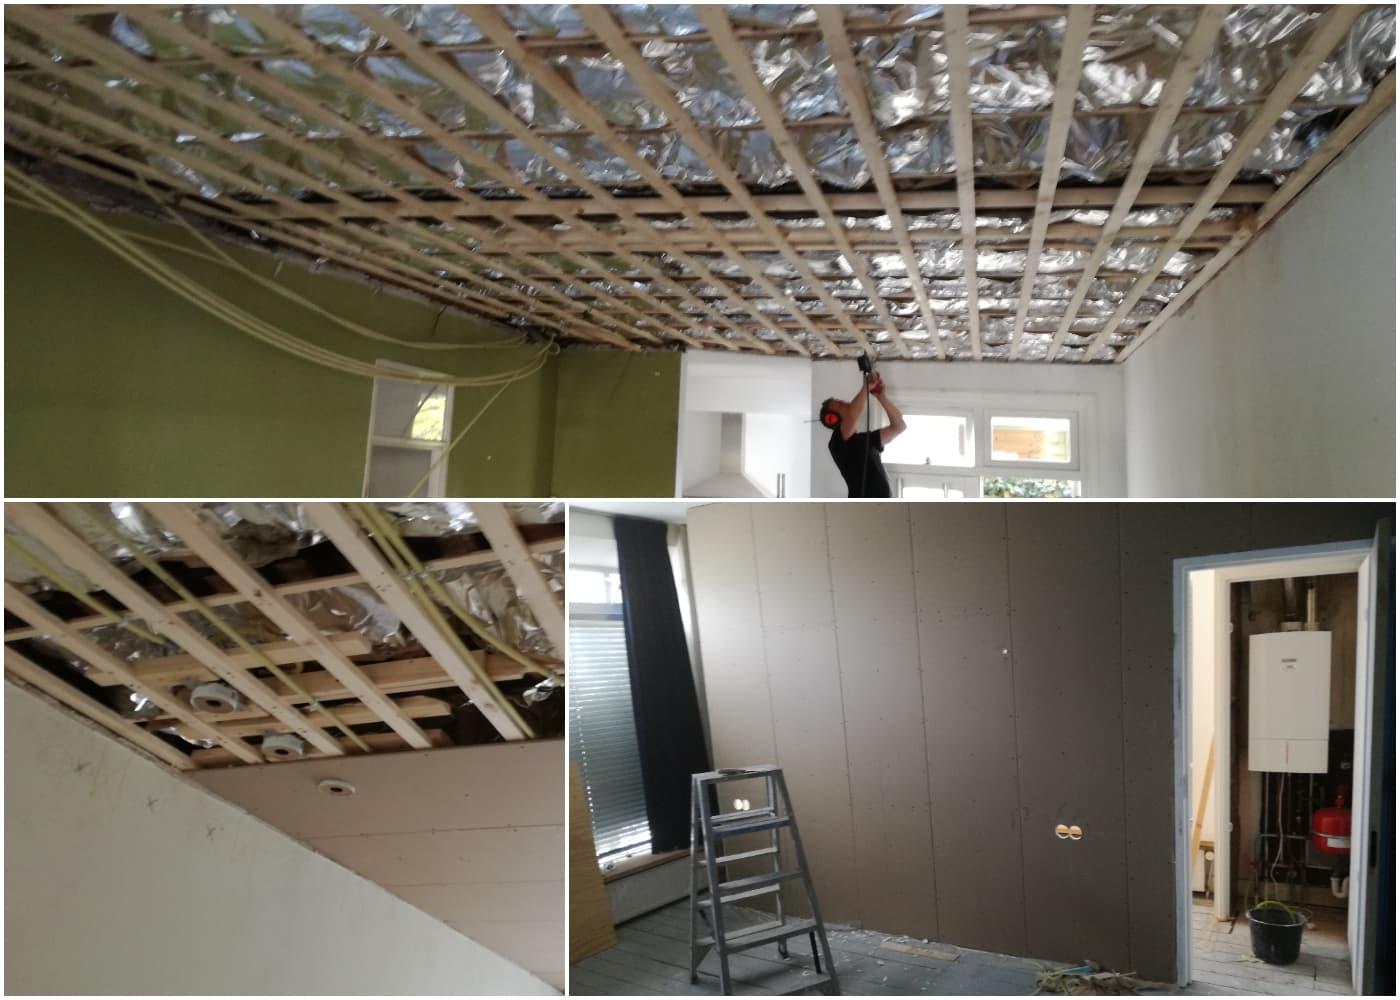 verbouwing amsterdam: plafond vernieuwen en tussenwand plaatsen